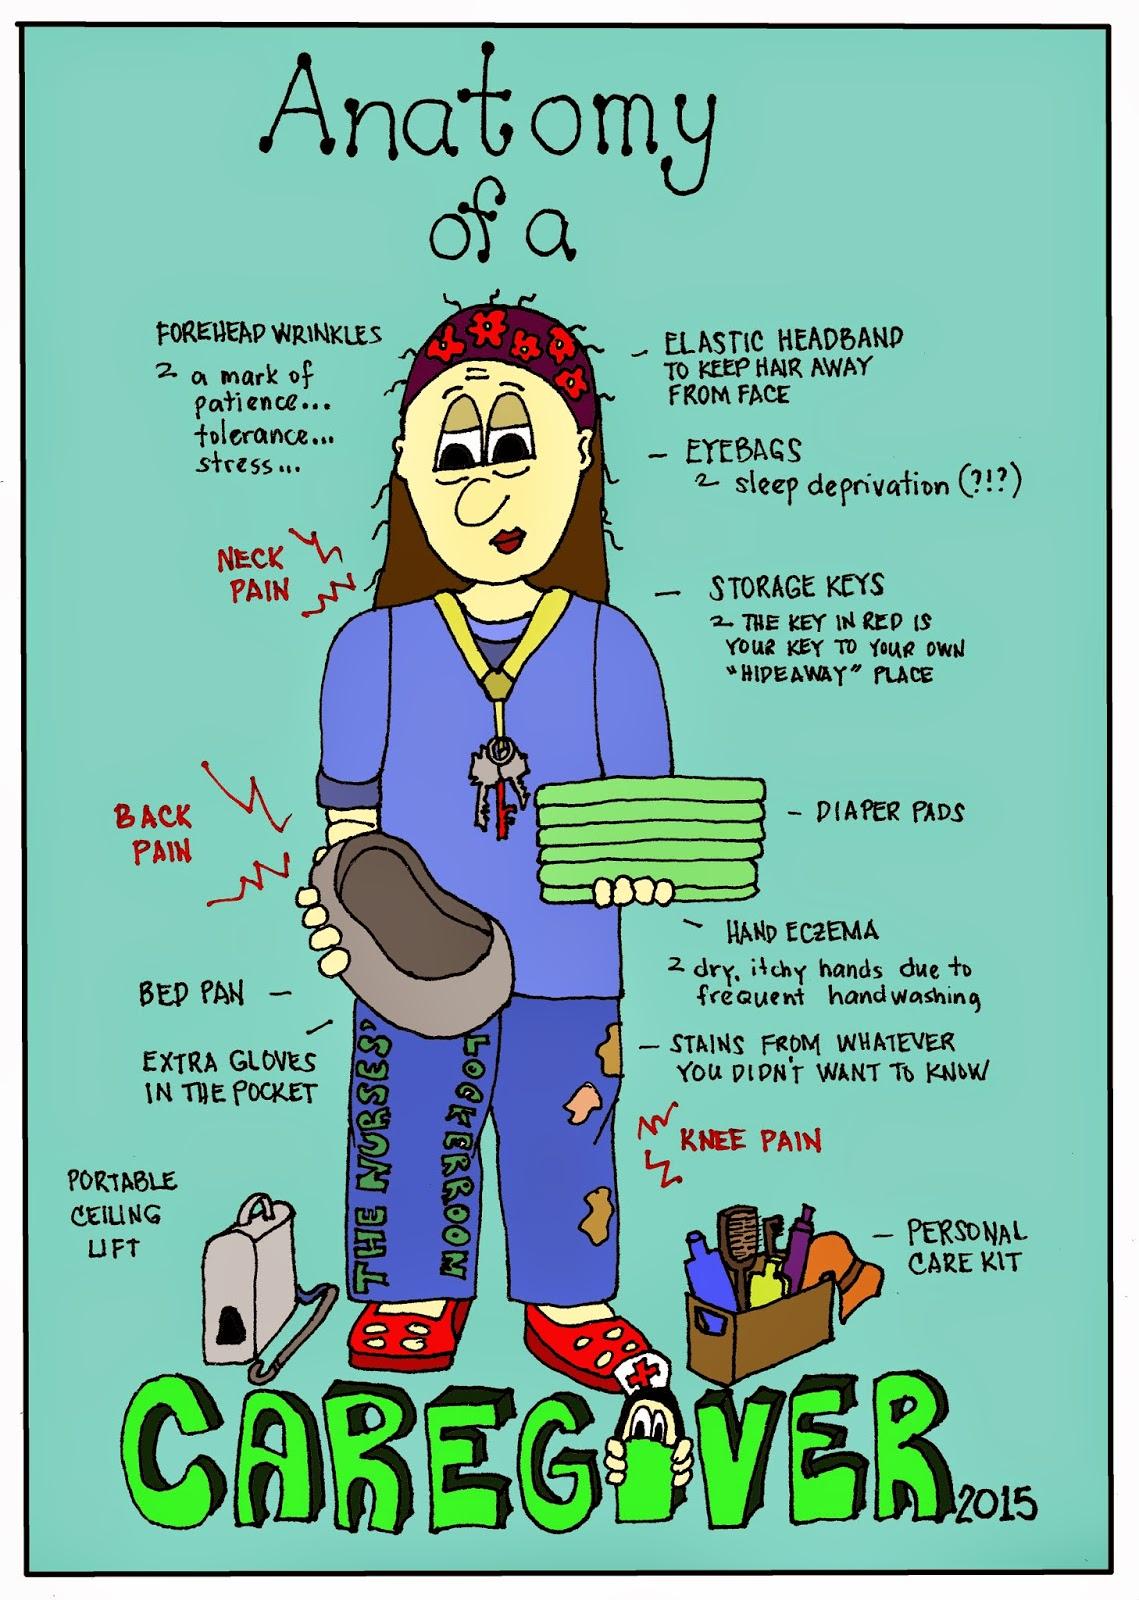 The Nurses\' Locker Room : Anatomy of a Caregiver